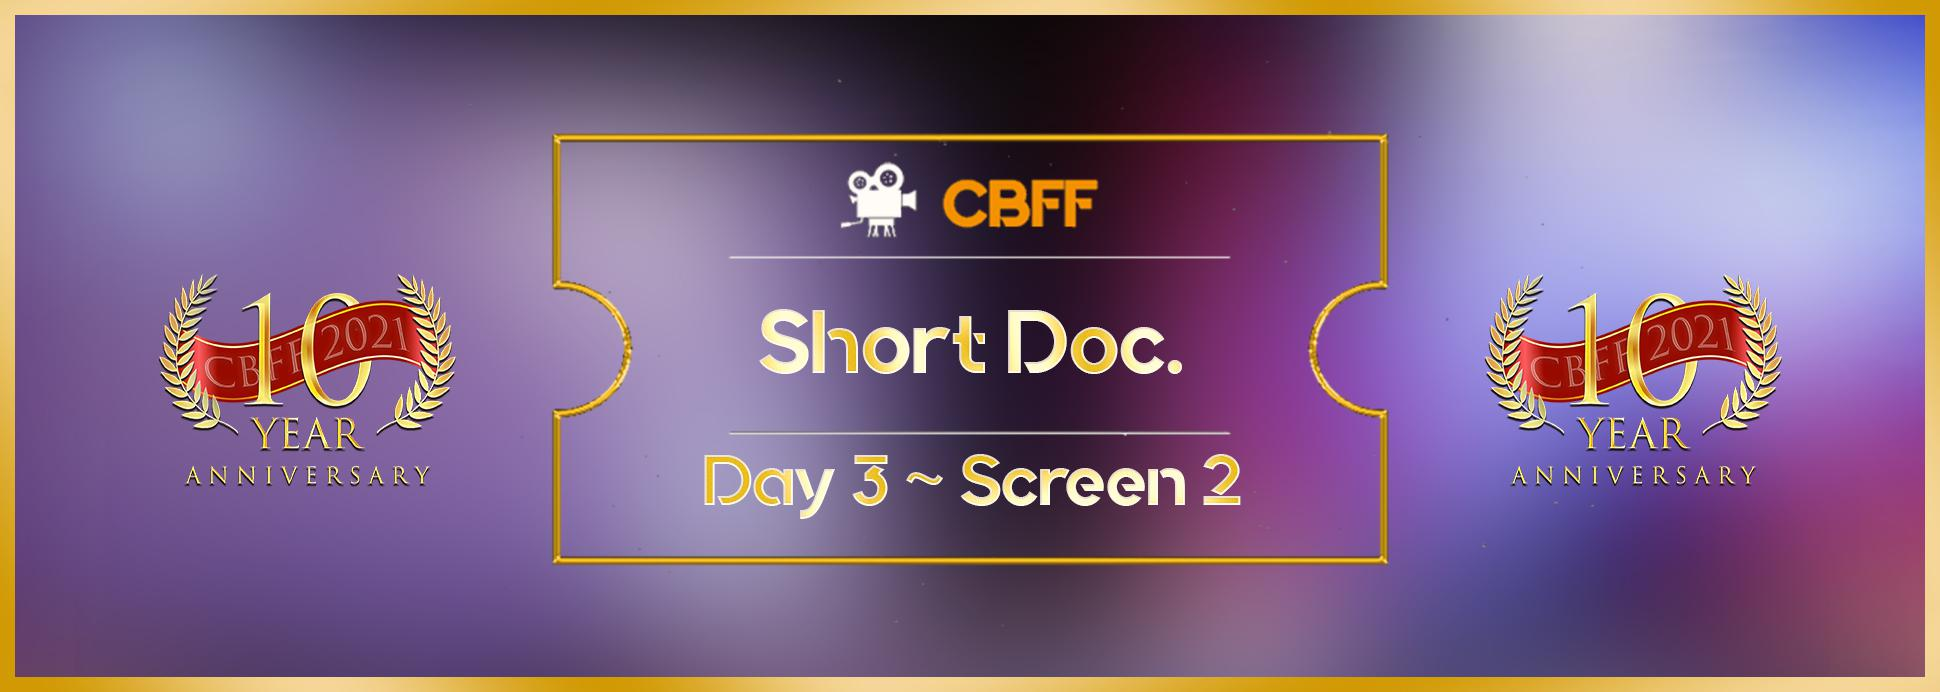 Day 3, Screen 2: Short Doc.